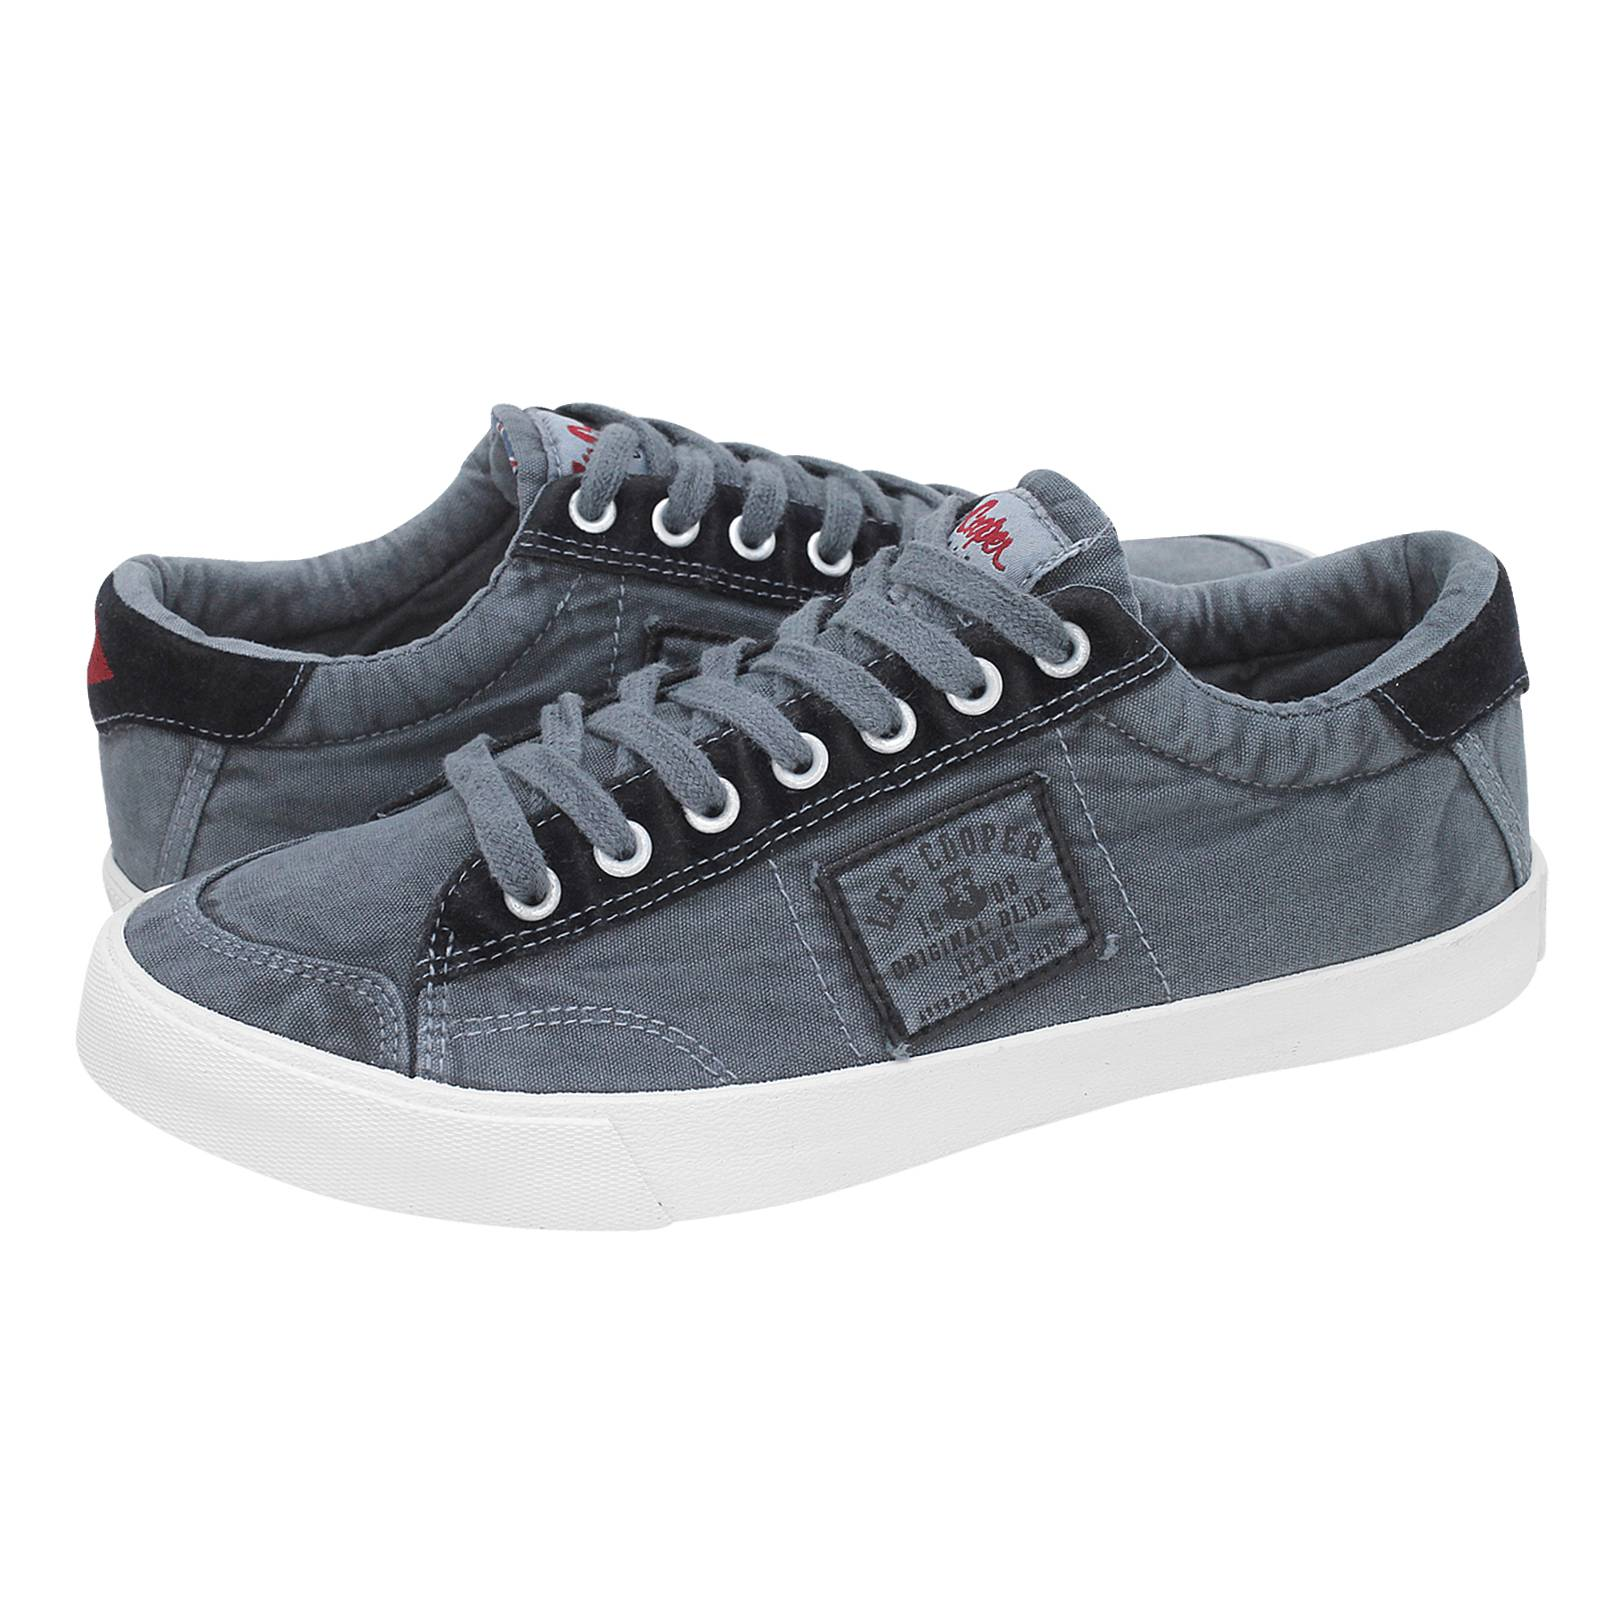 e3829f64796c Liverpool - Ανδρικά παπούτσια casual Lee Cooper από υφασμα - Gianna ...